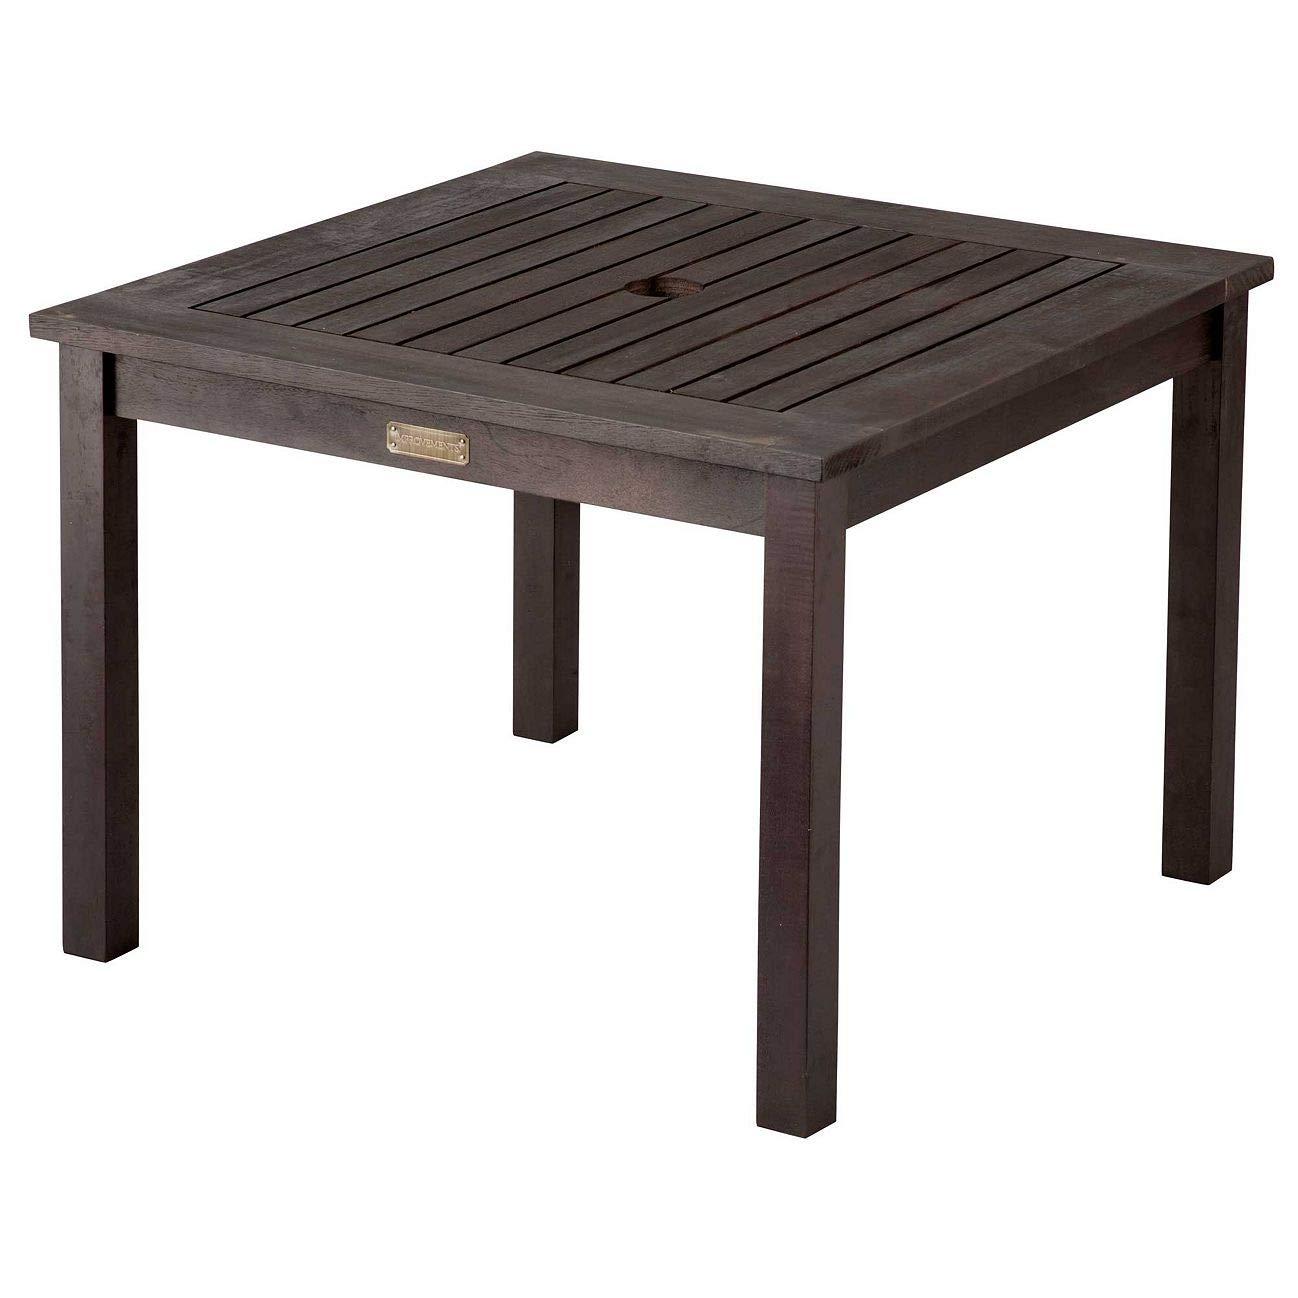 Outdoor Side Table Umbrella Grottepastenaecollepardo